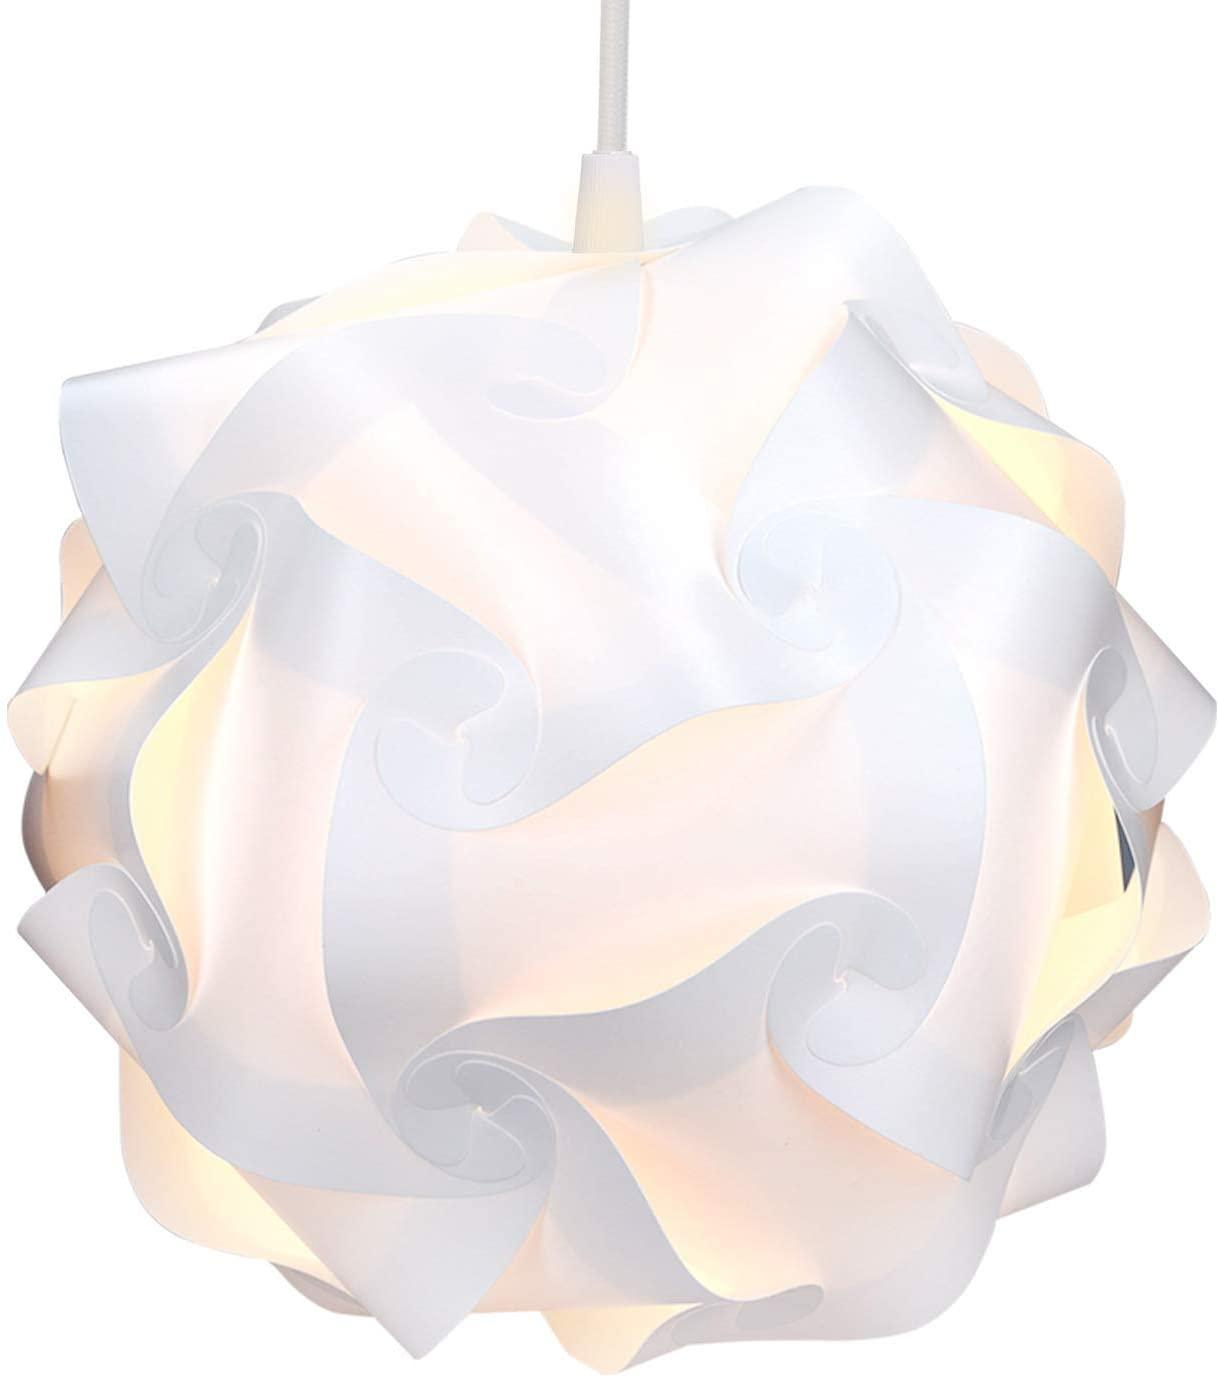 kwmobile Puzzle Lamp Pendant Light - 7.9